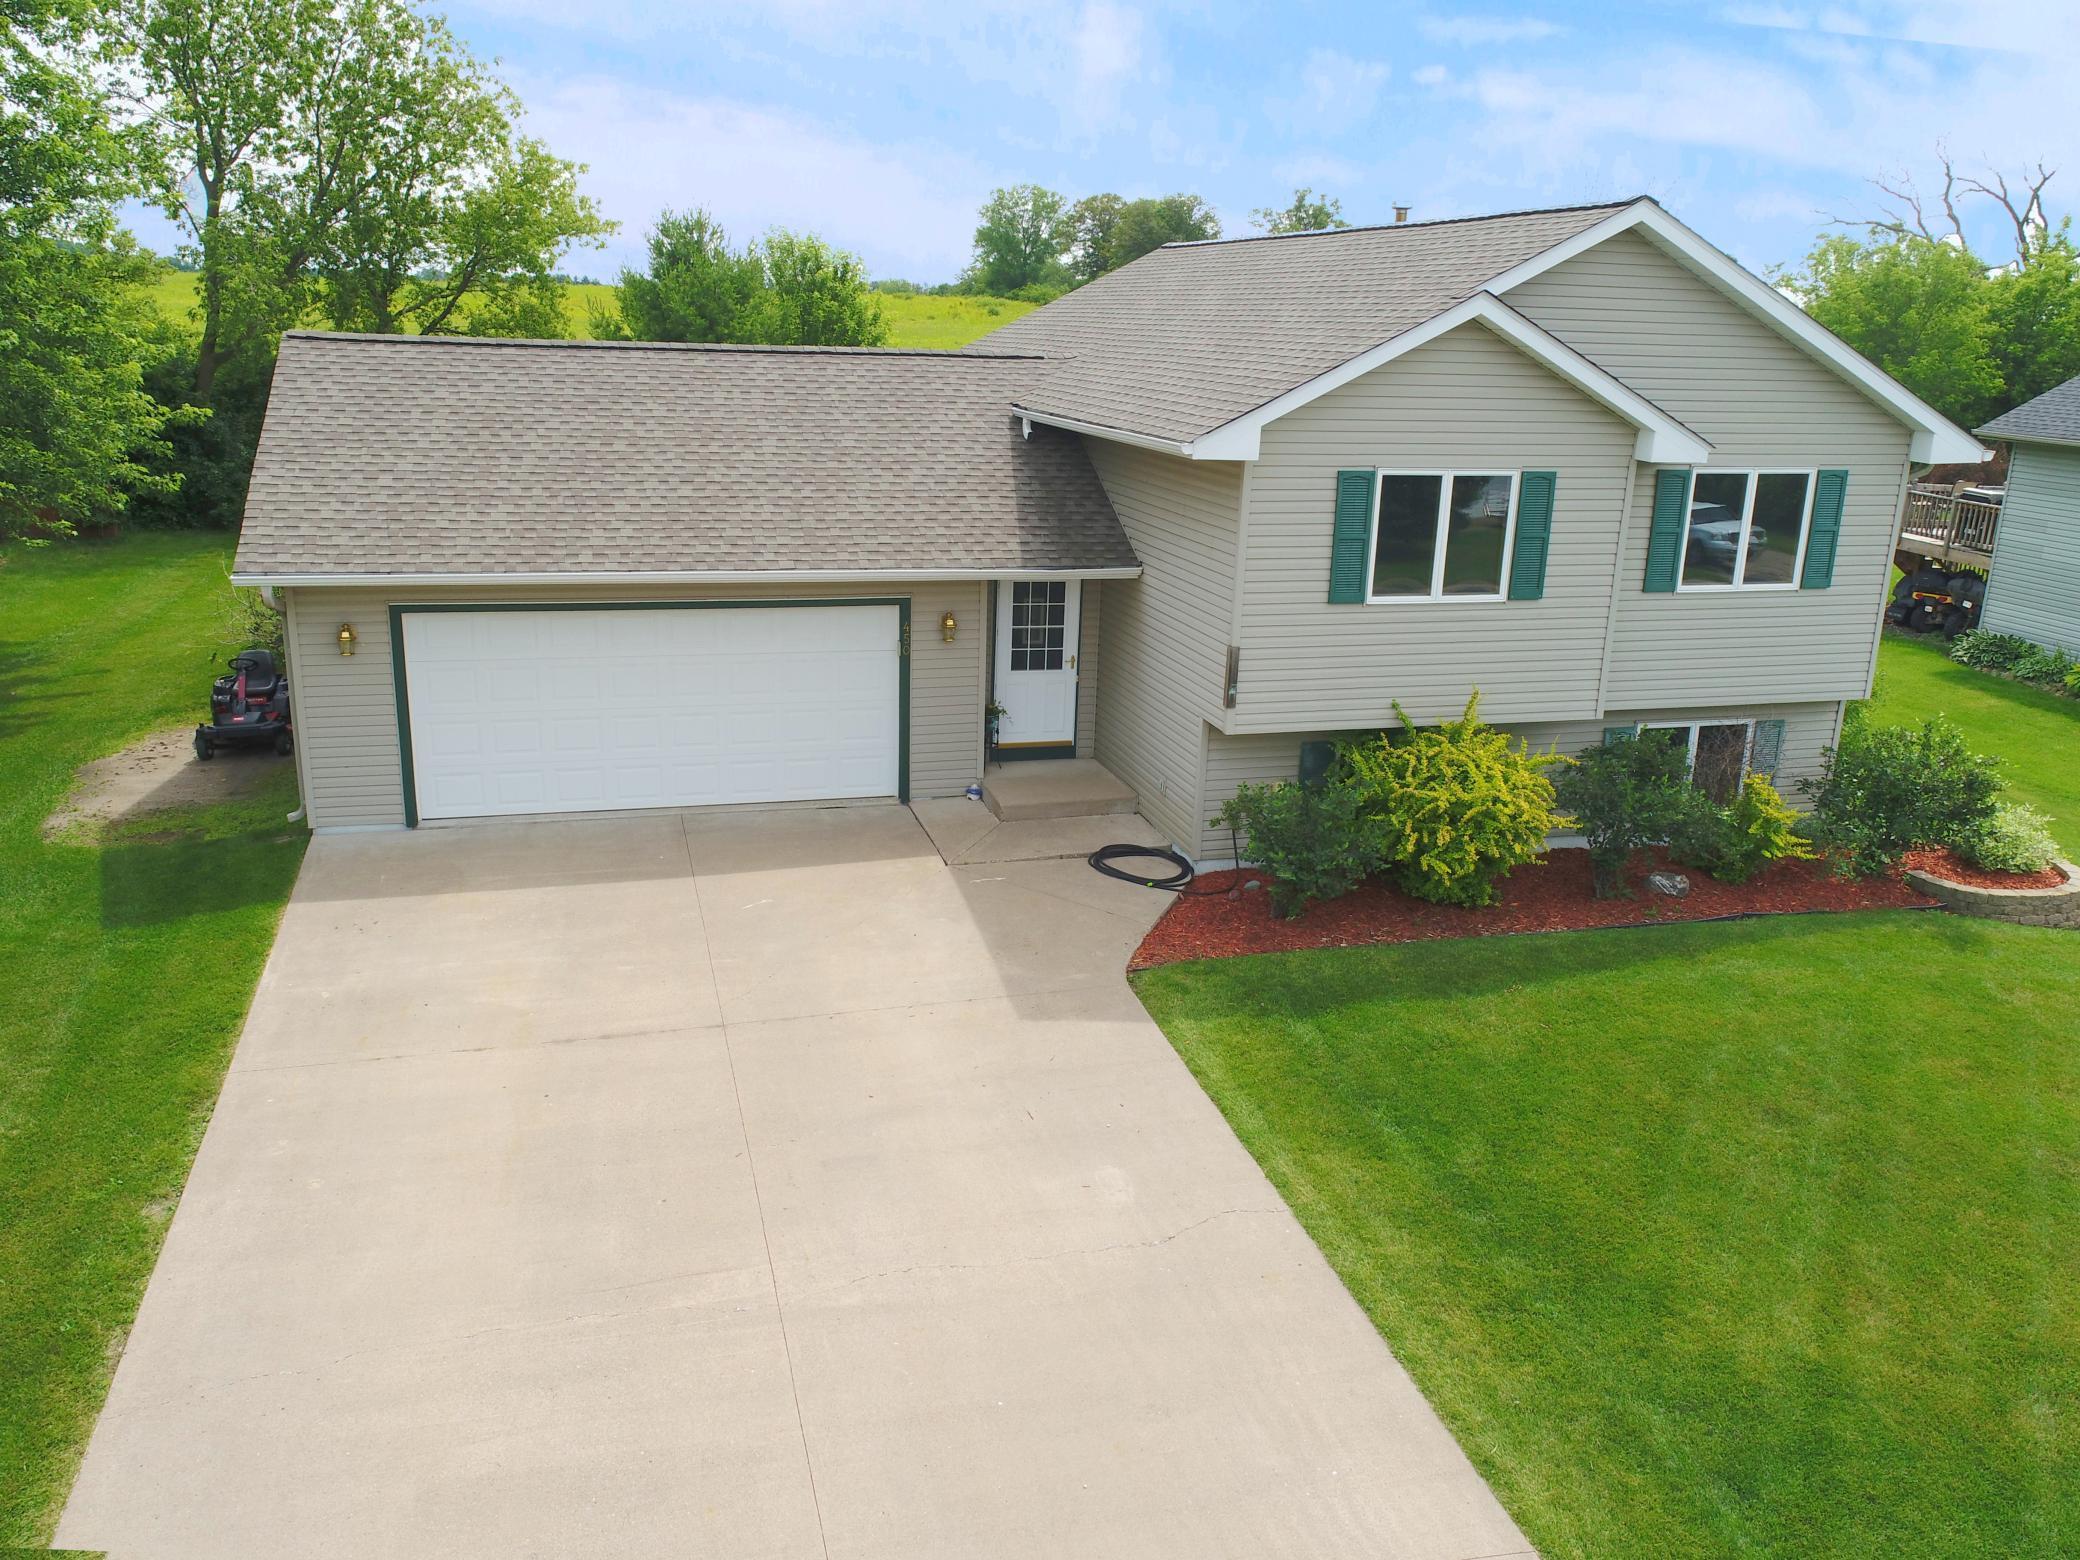 450 5th Property Photo - Baldwin, WI real estate listing